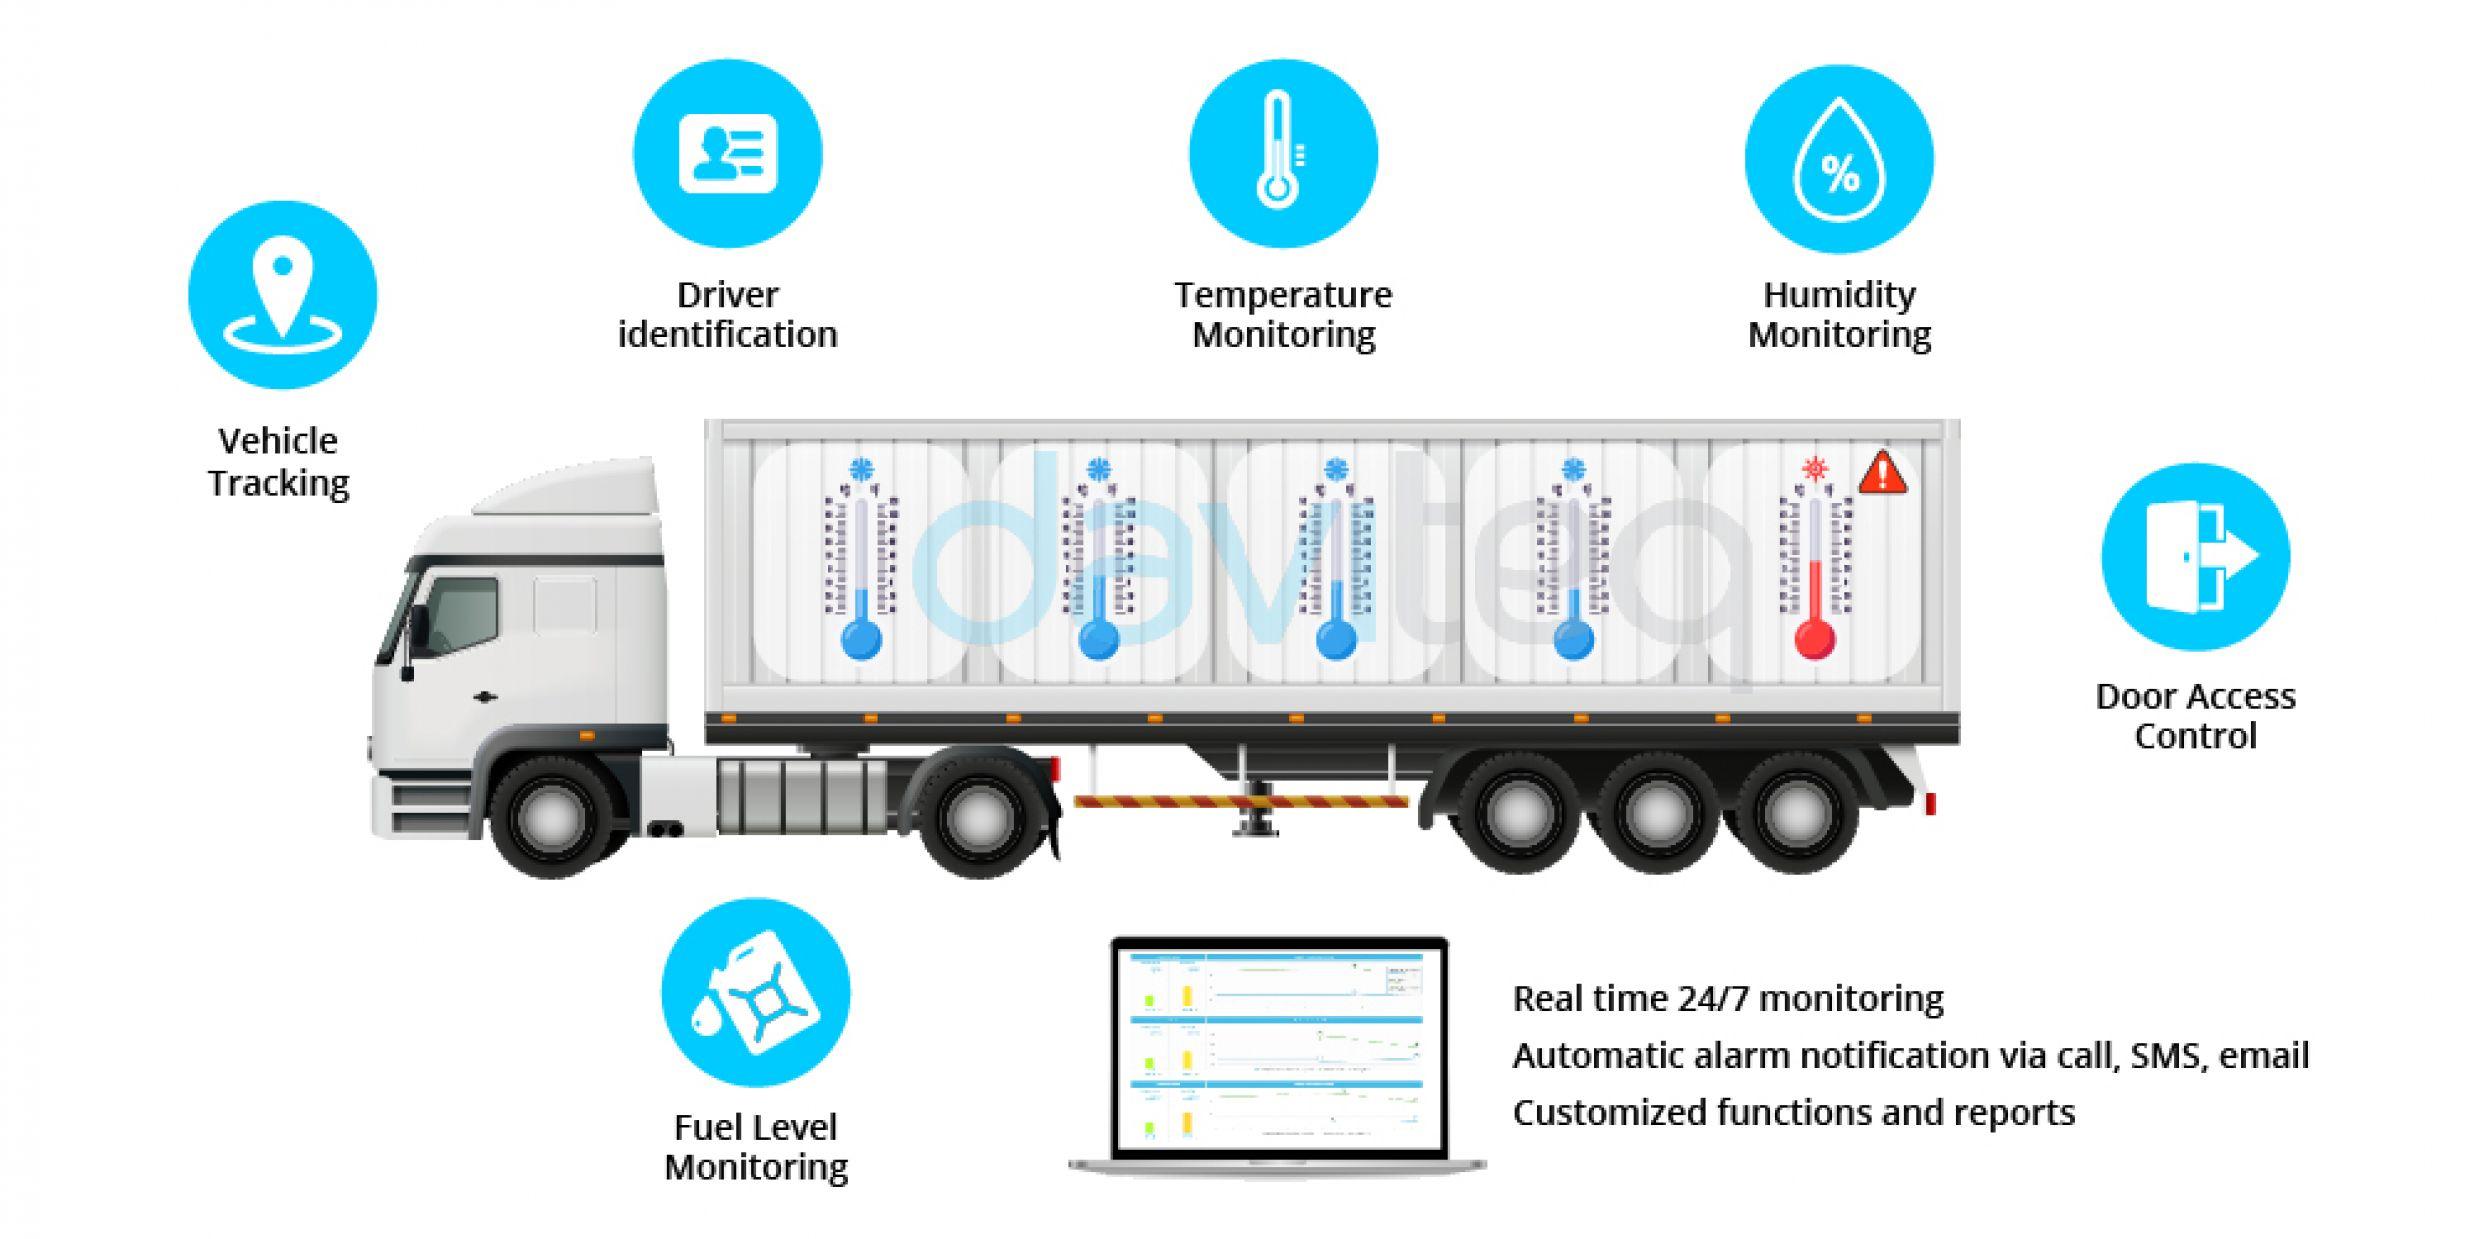 smarTrans - Refrigerated Truck Temperature Monitoring Solution